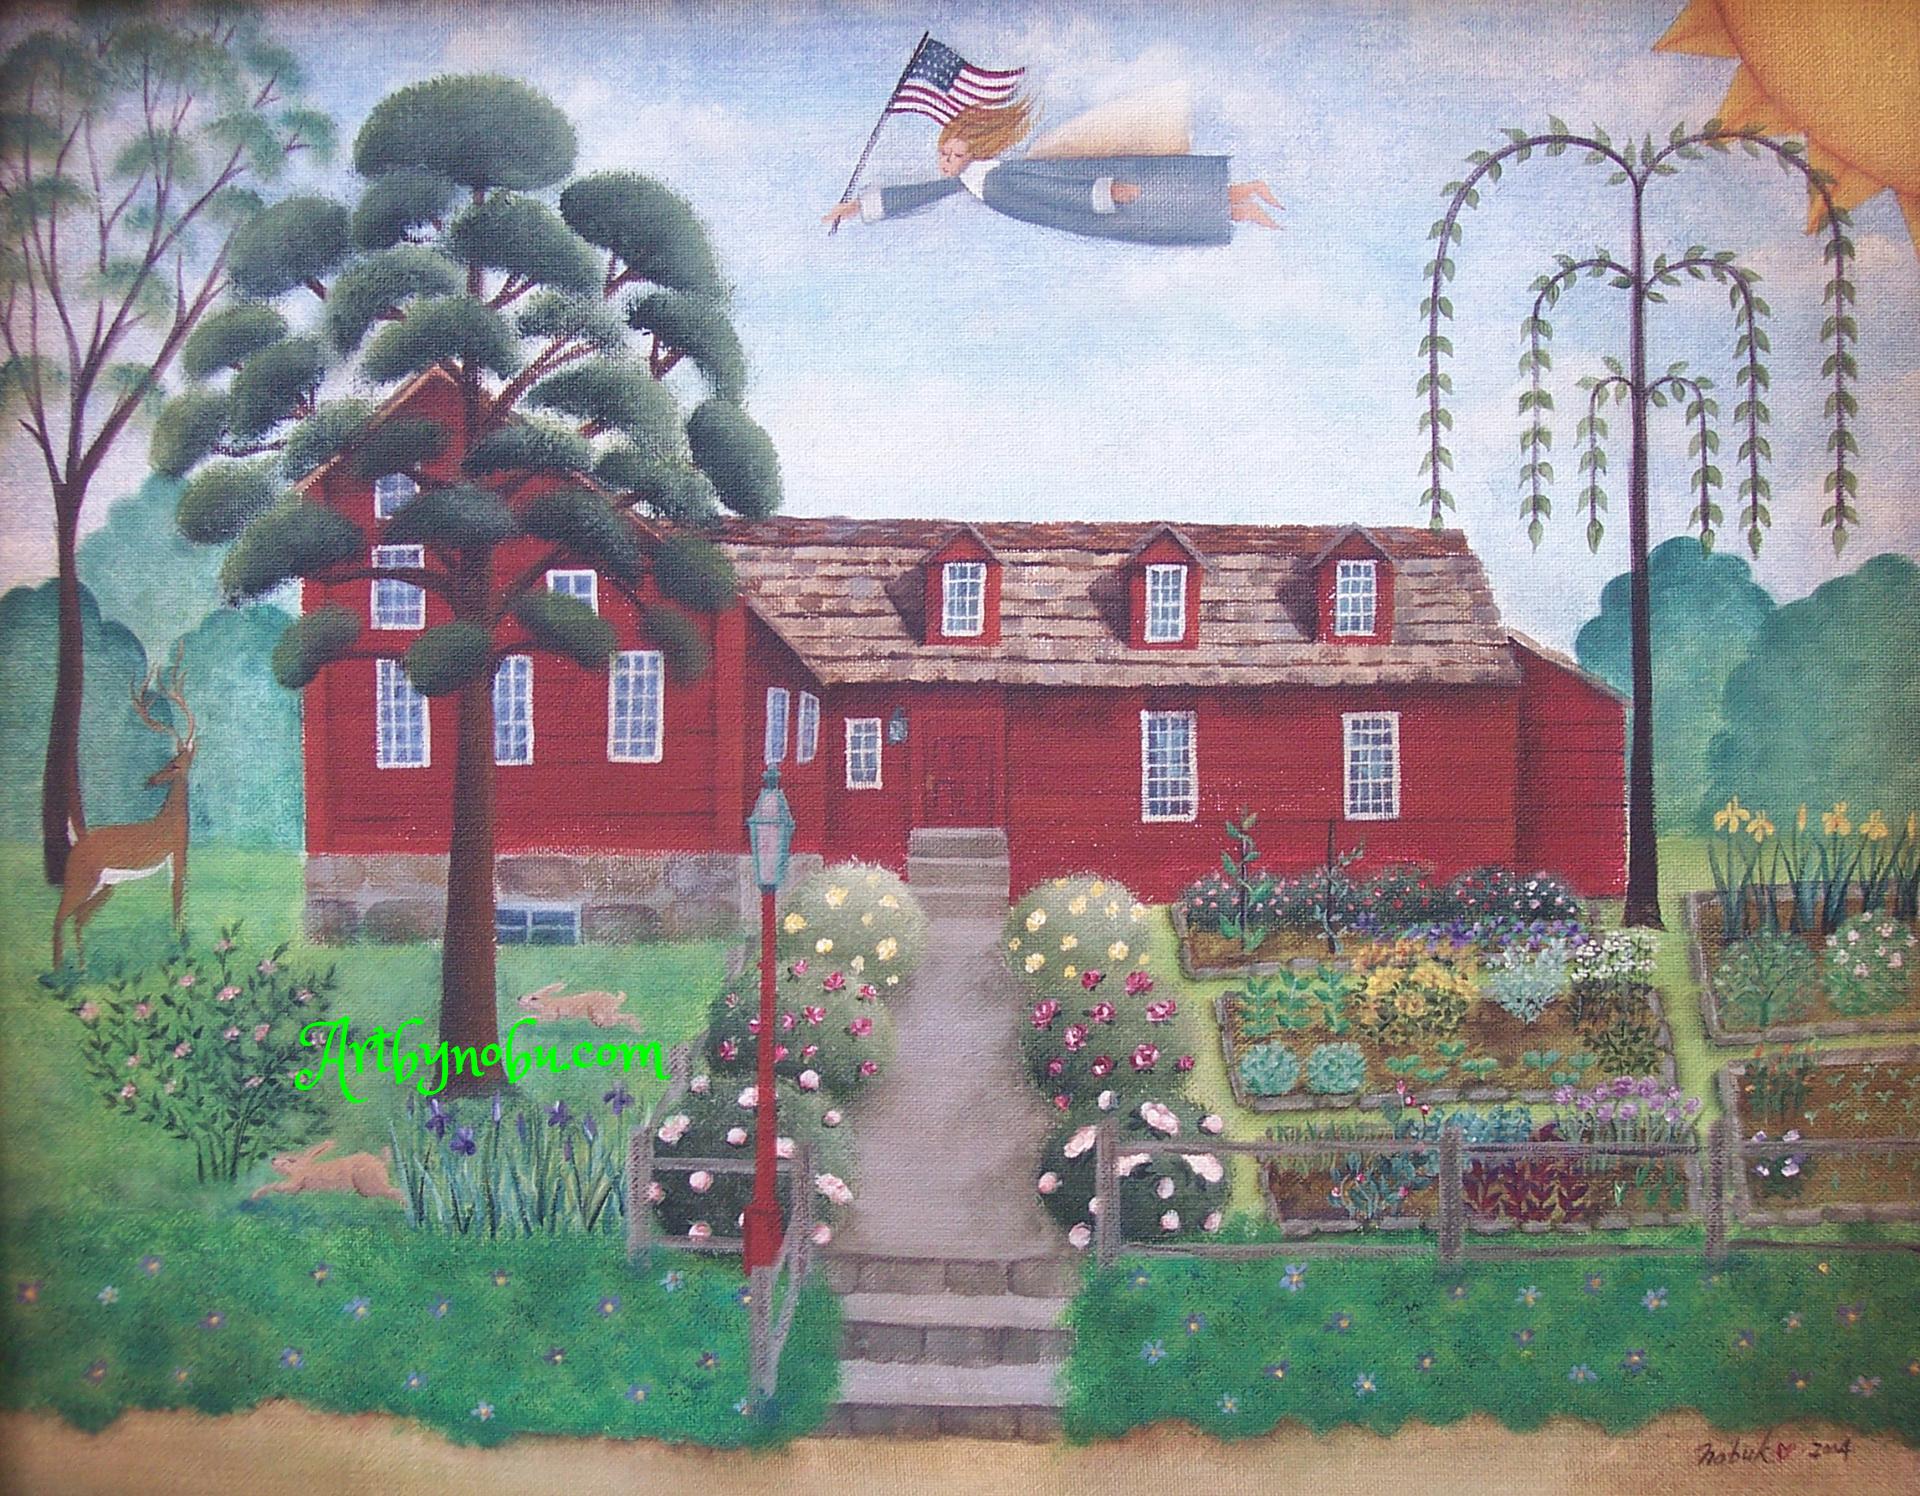 Bates-Scofield House